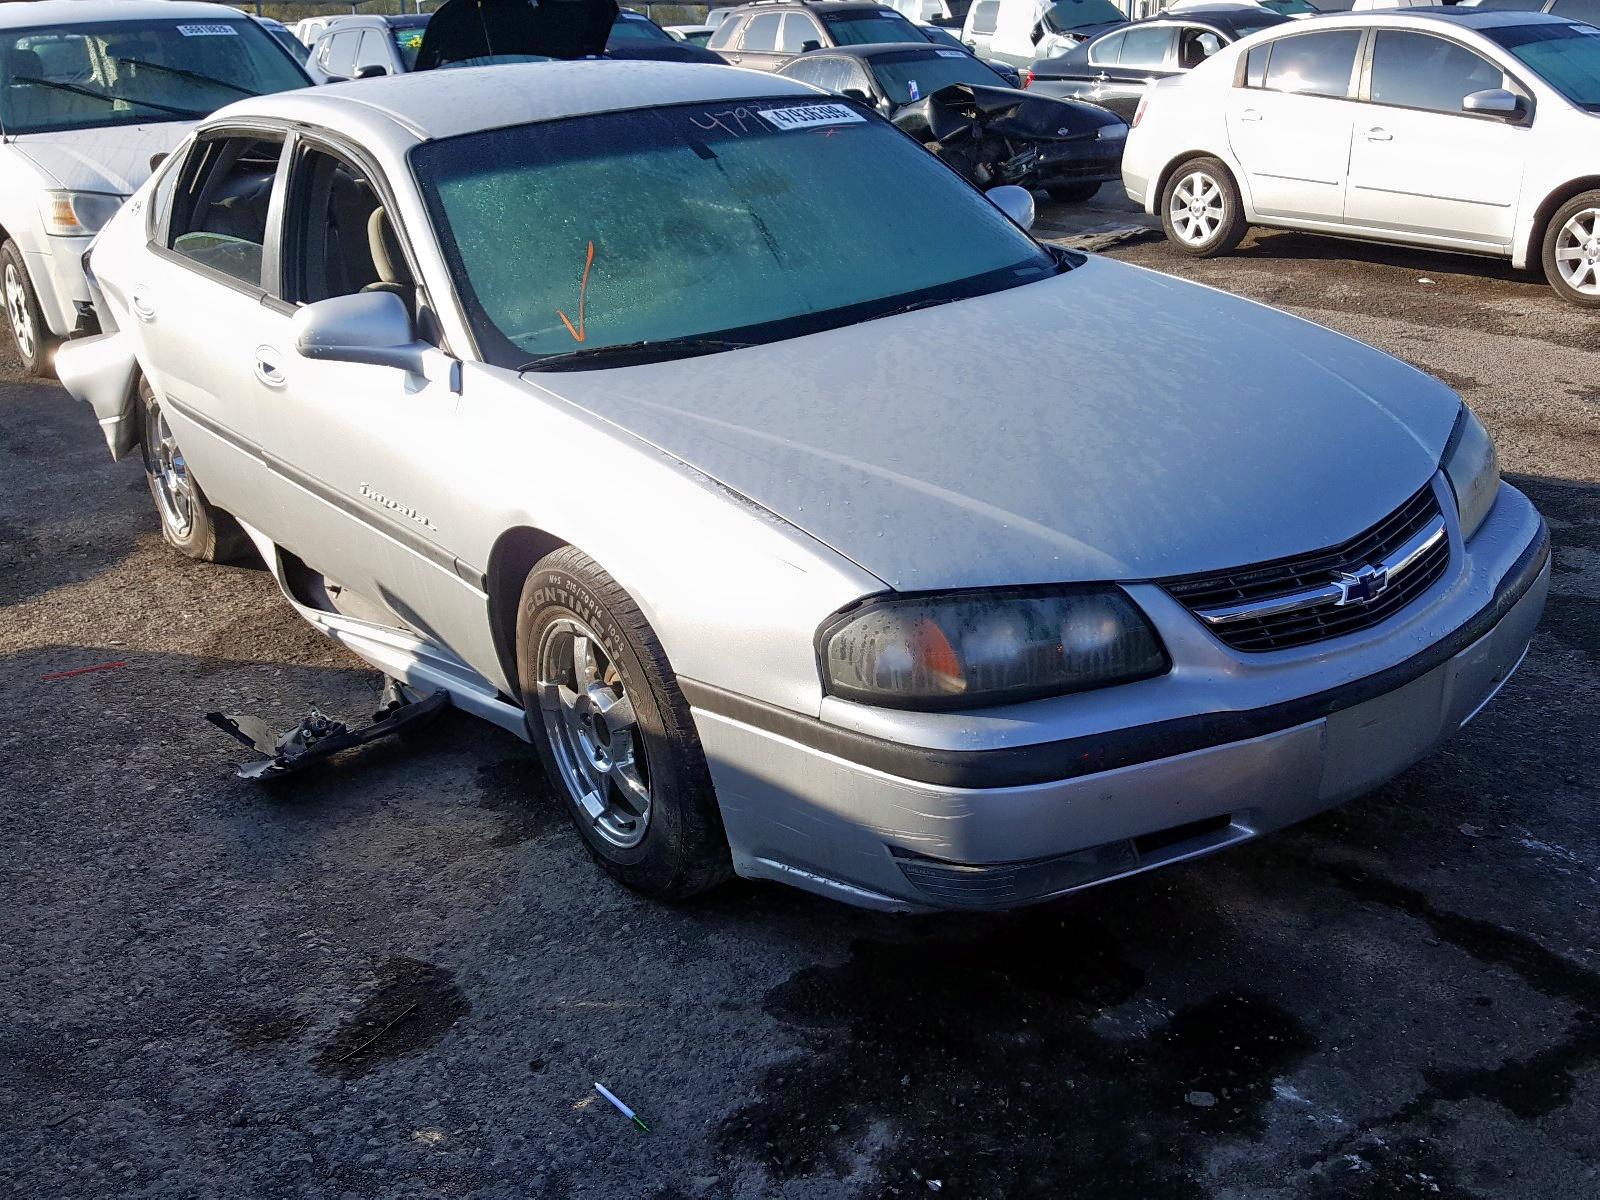 2000 Chevrolet Impala Ls 3.8L Left View